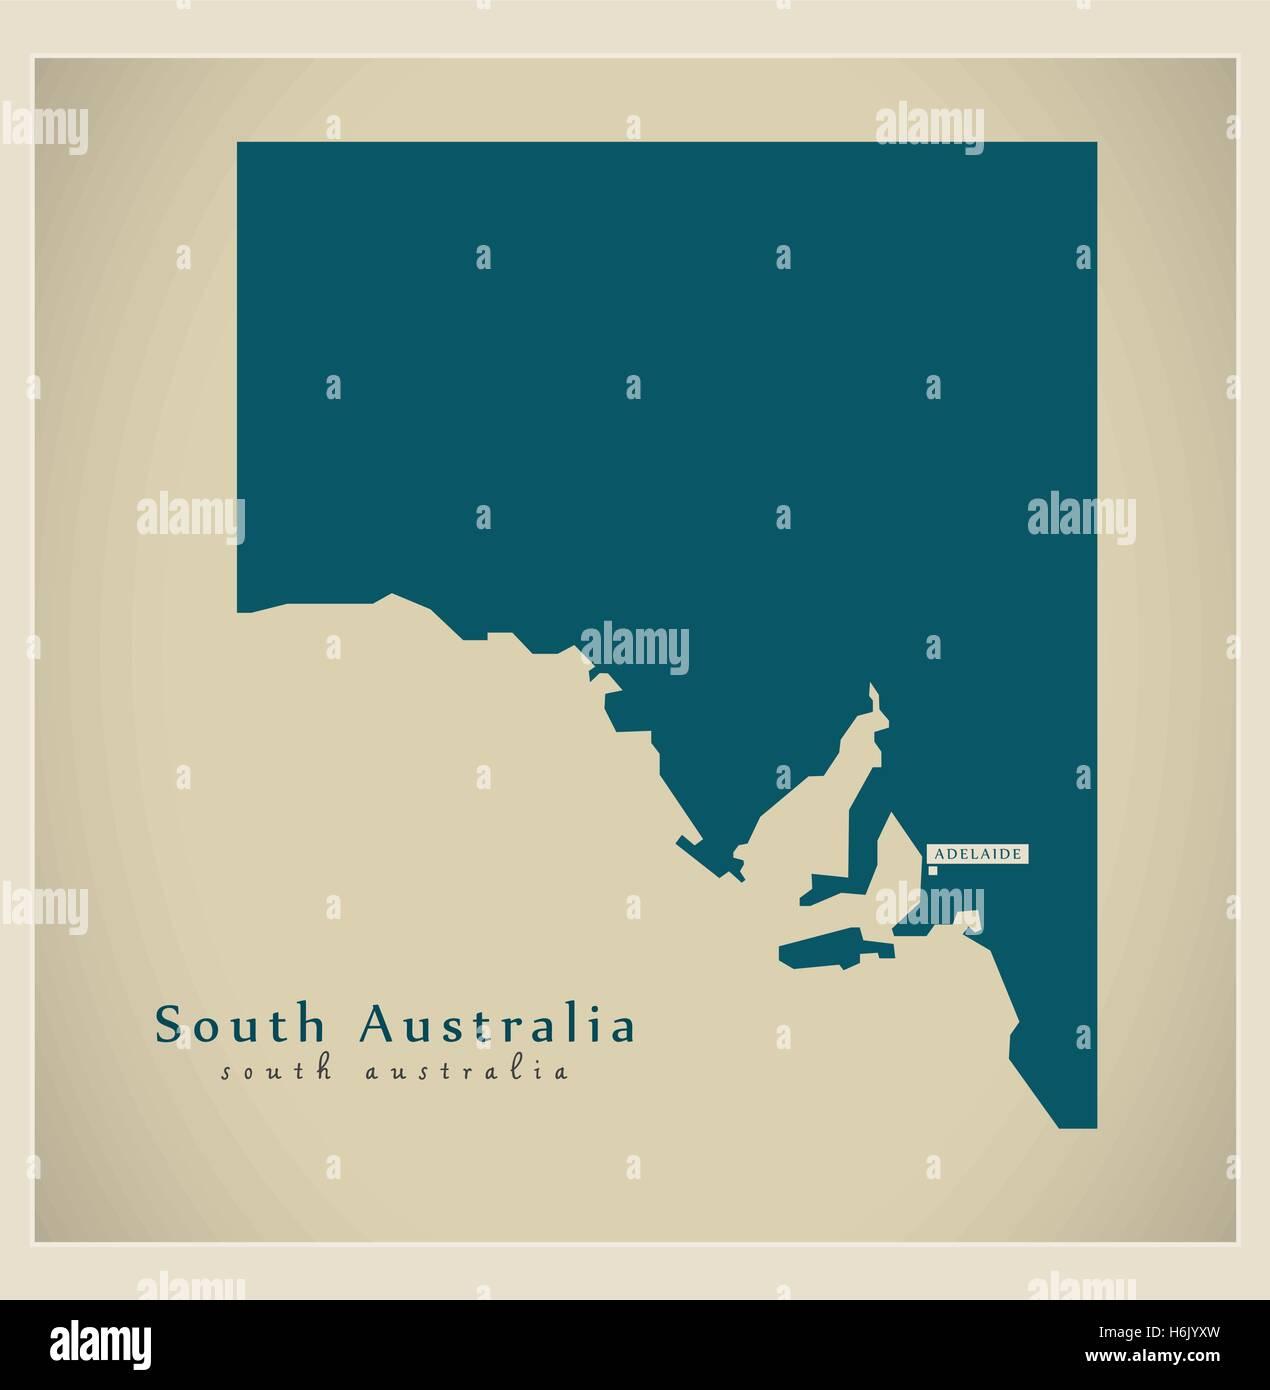 Modern Map - South Australia AU - Stock Image